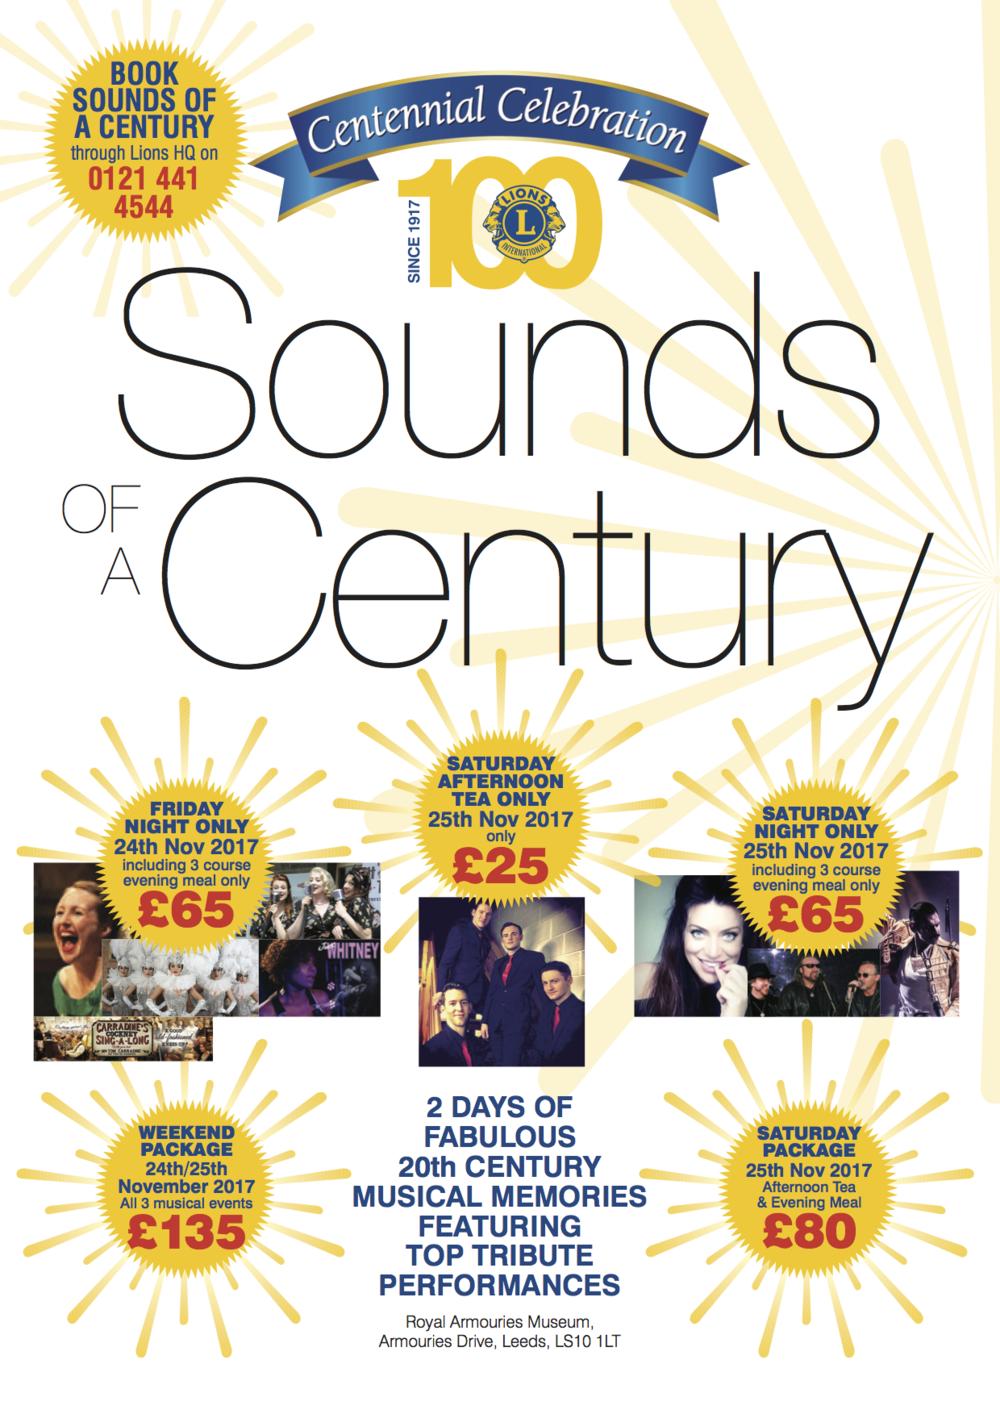 Sounds Of A Century BK FORM p2-3 no ticks.png